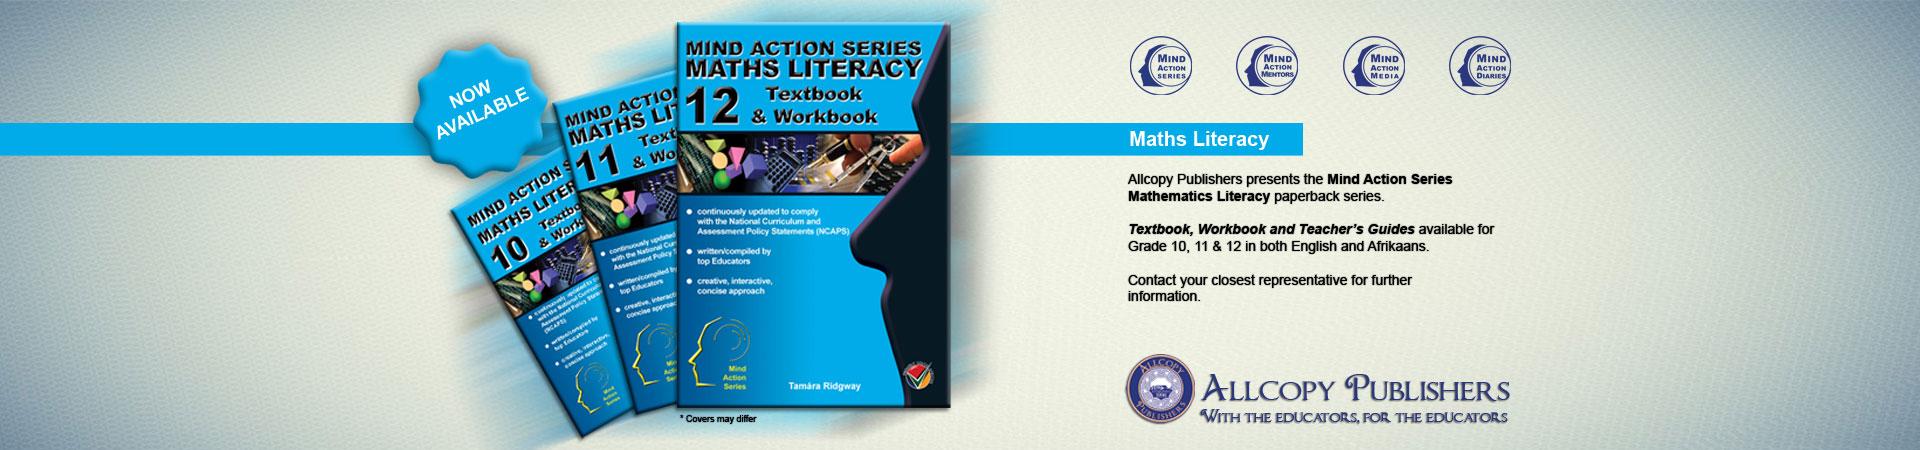 Maths-Literacy2